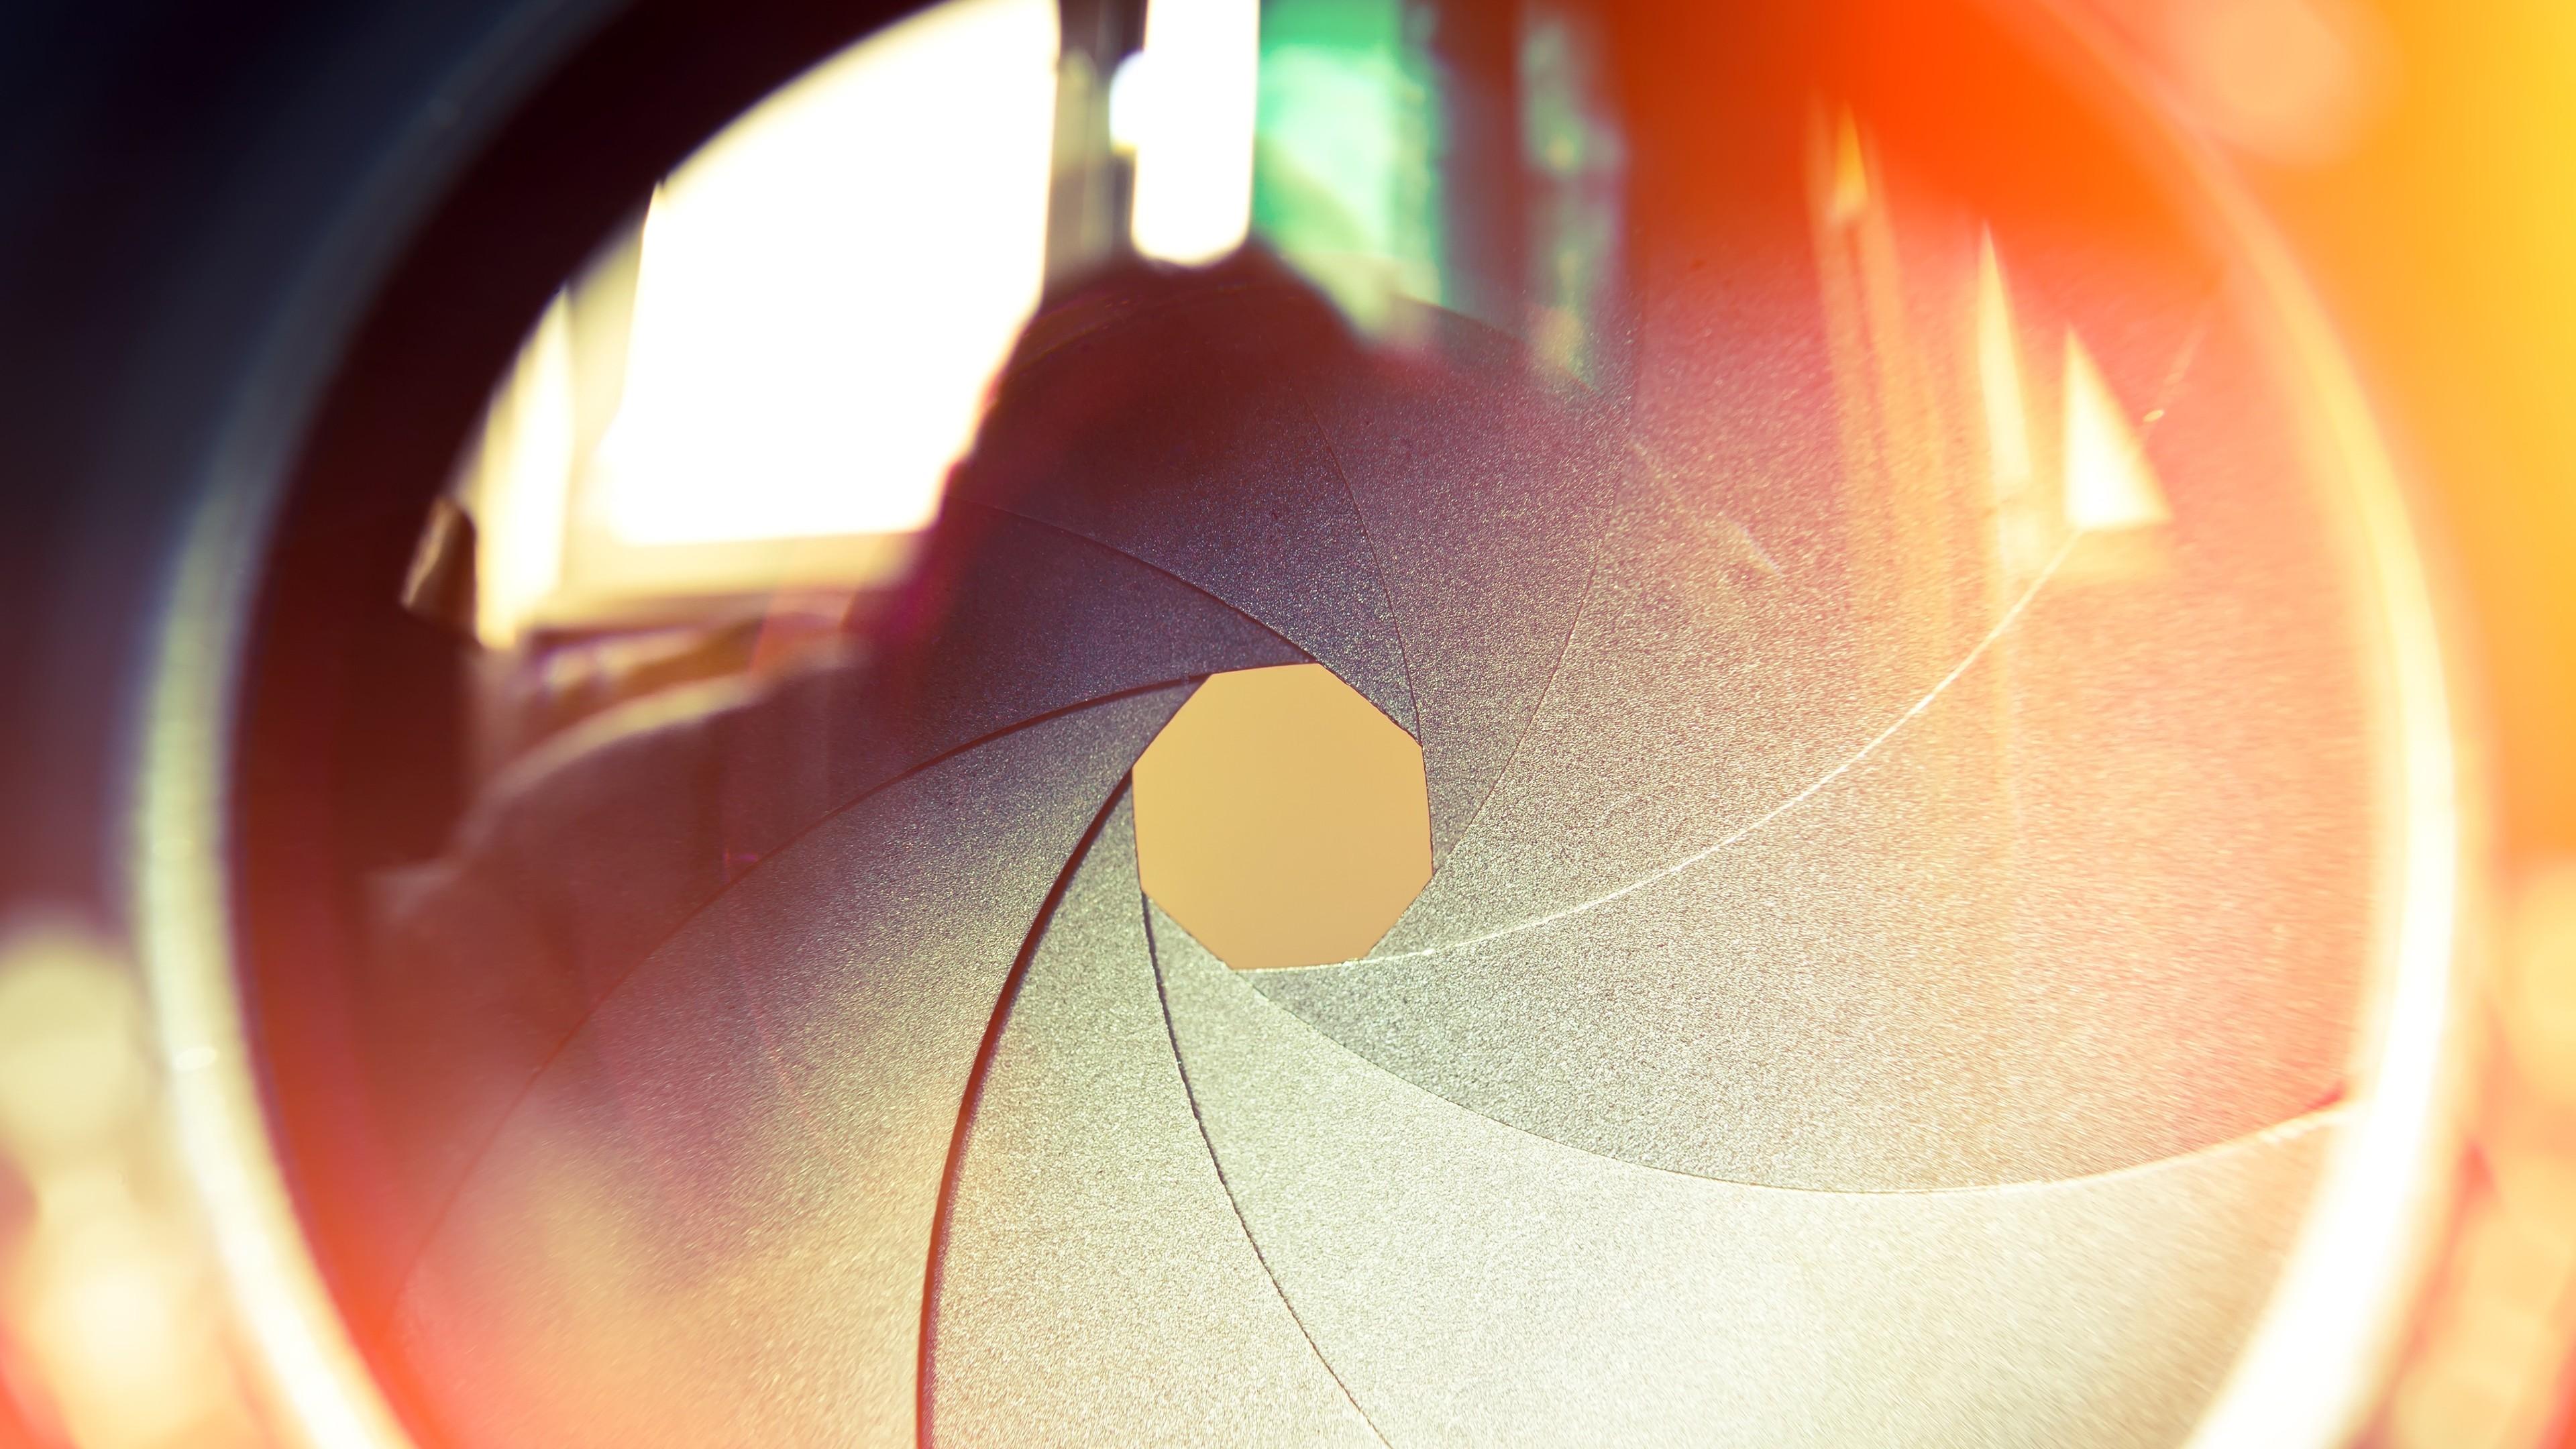 lens macro abstract 4k 1546277884 - Lens Macro Abstract 4k - lens wallpapers, hd-wallpapers, camera wallpapers, abstract wallpapers, 4k-wallpapers